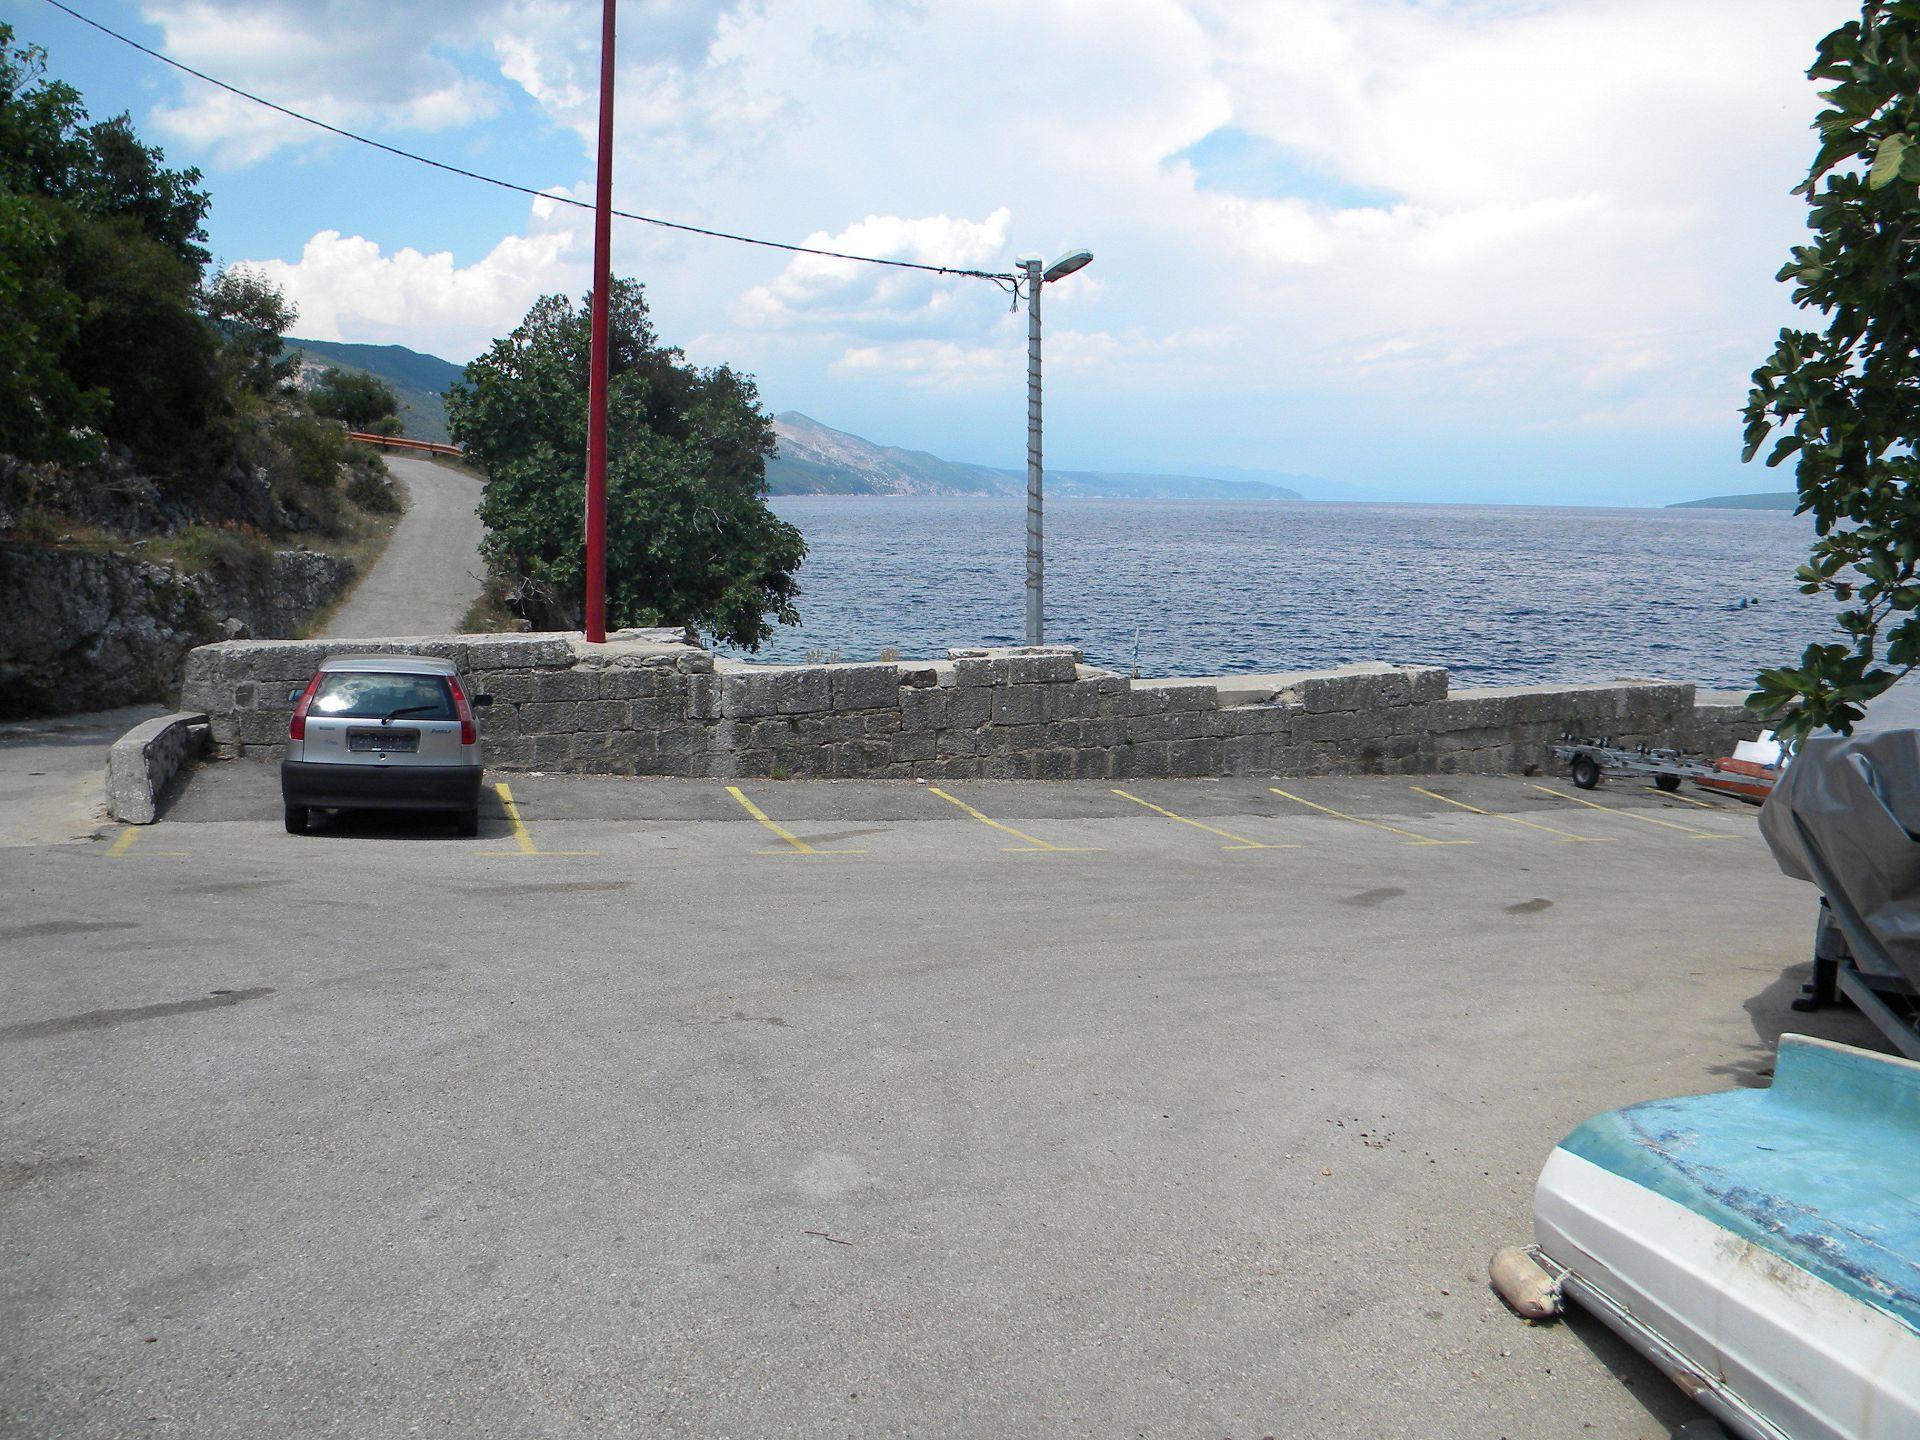 Appartement de vacances BT A2(4) - Merag (769321), Merag, Île de Cres, Kvarner, Croatie, image 8